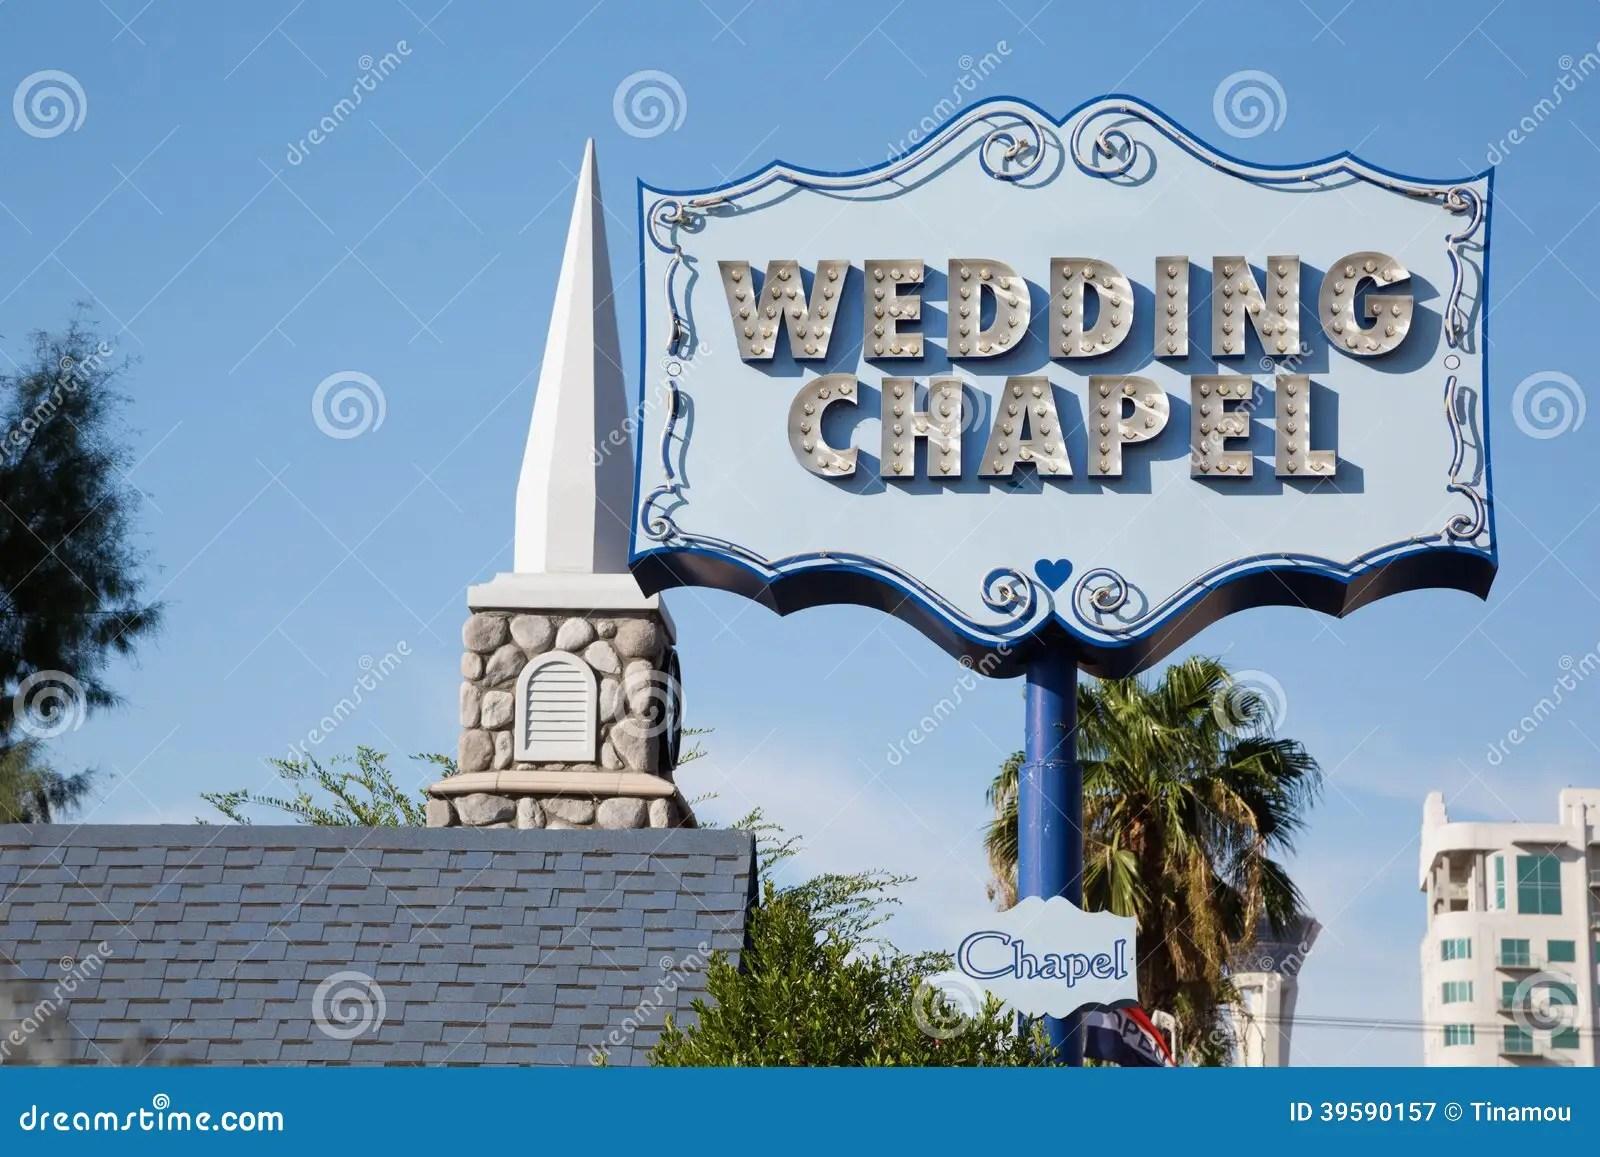 Viva Las Vegas Wedding Chapels vegas wedding chapels Viva Las Vegas Wedding Chapels wedding venue picture 8 of 12 Provided by Viva